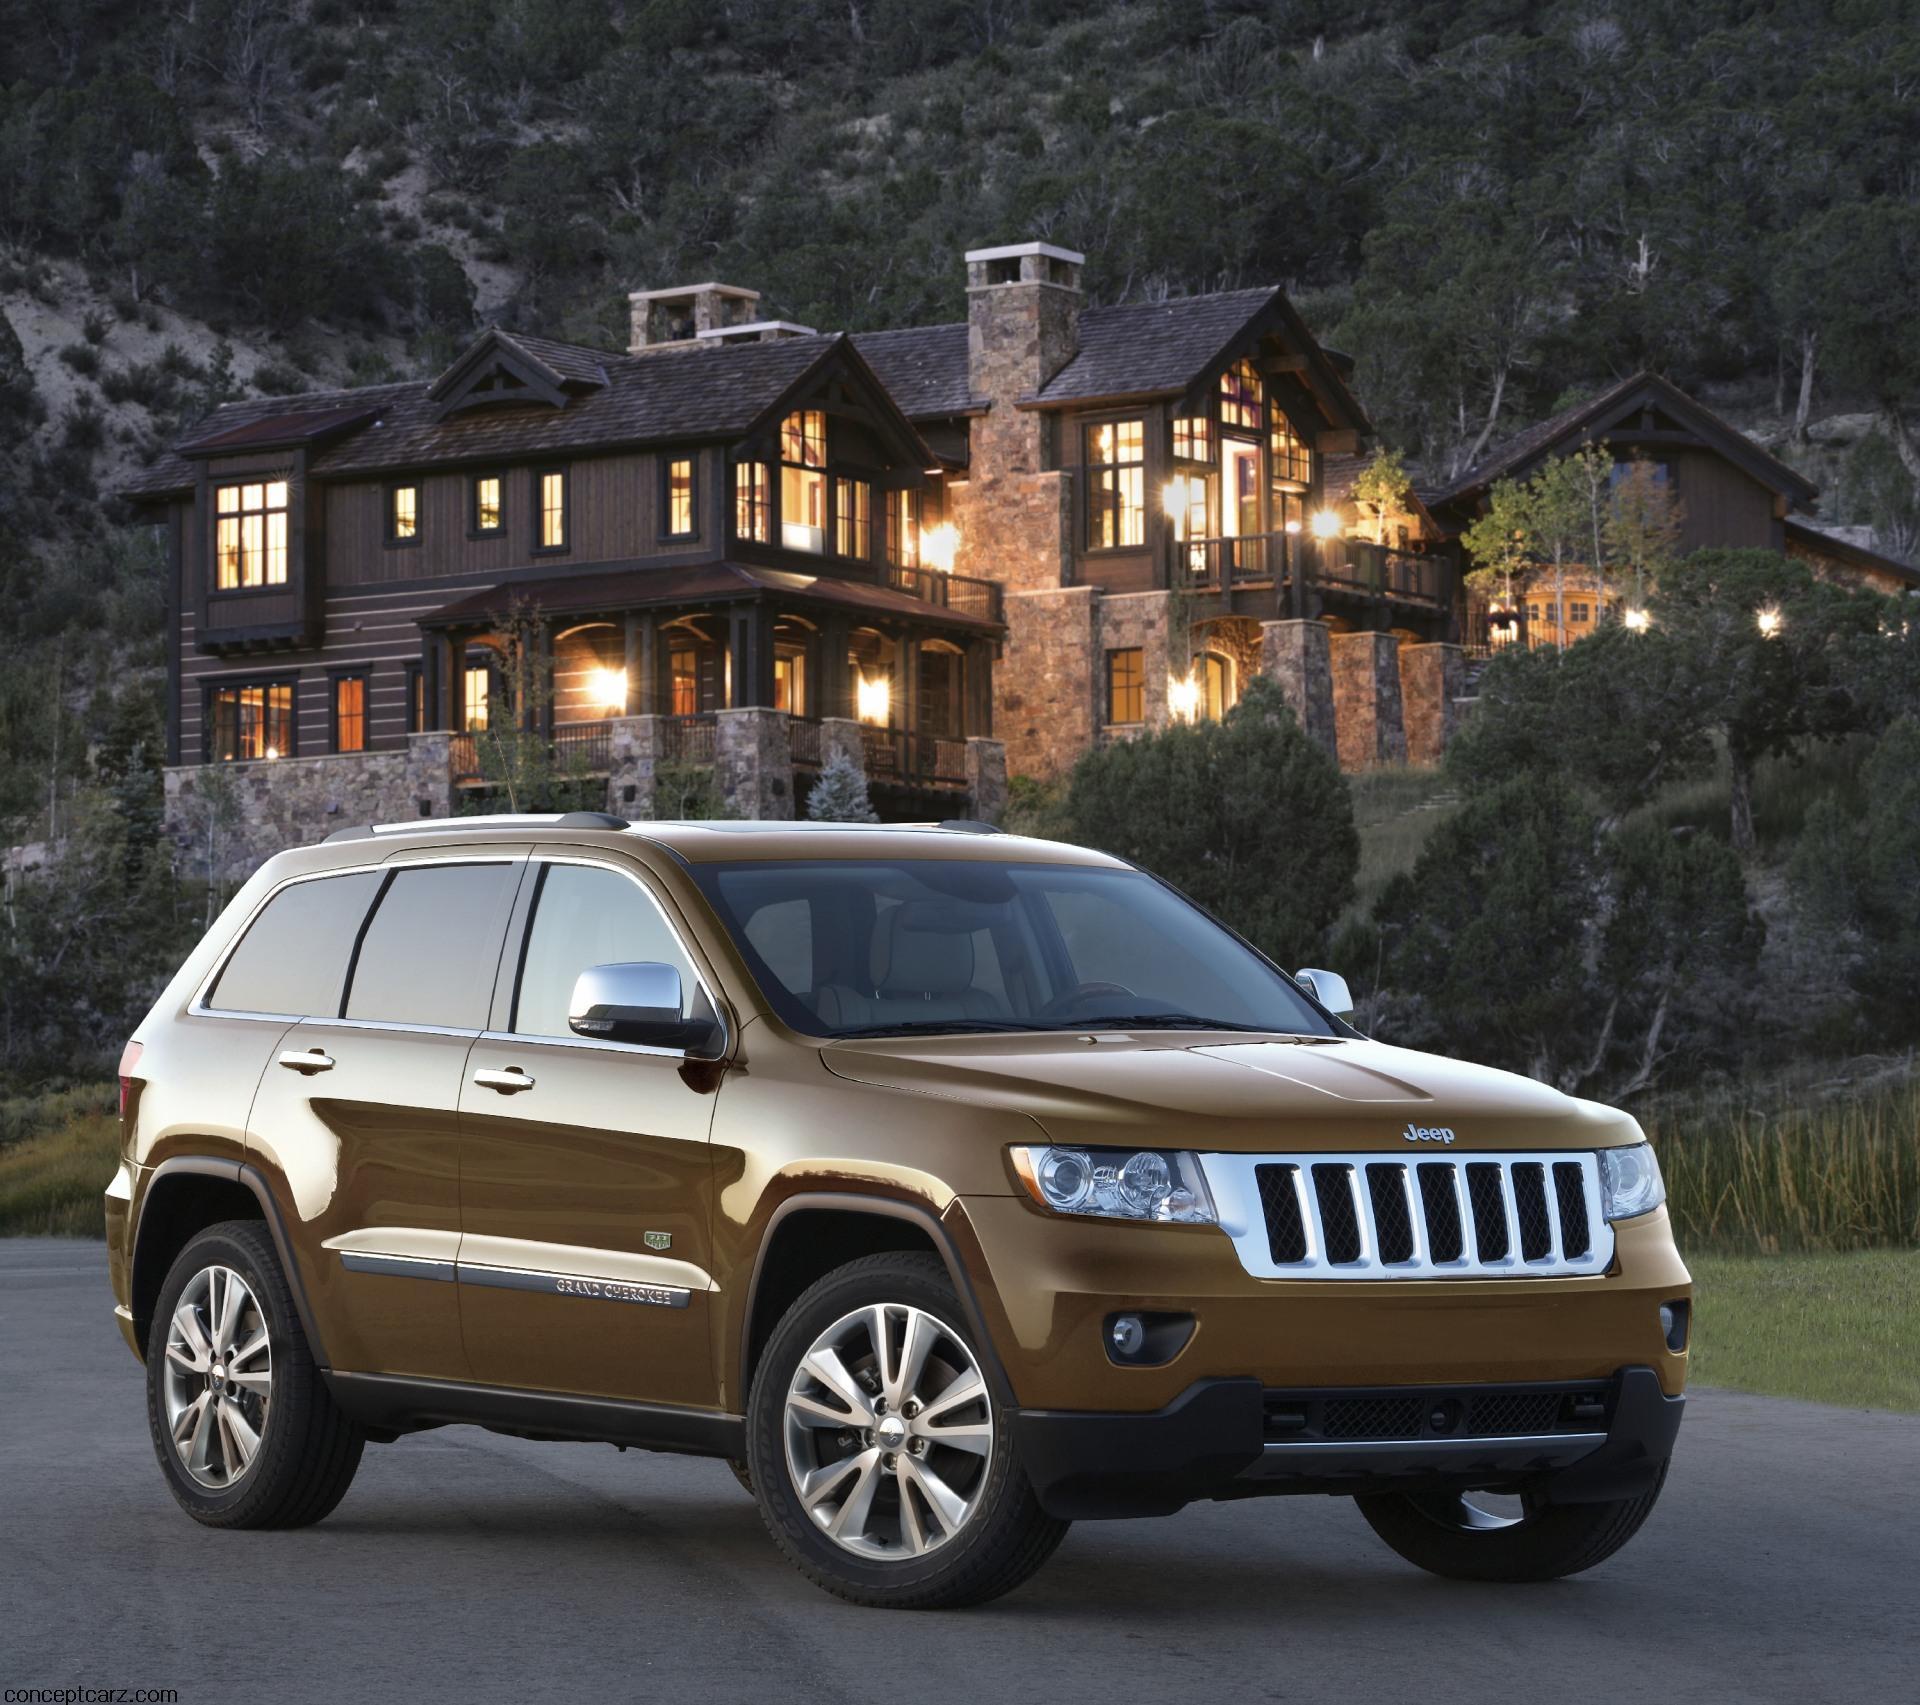 Jeep Cheroker: 2011 Jeep Grand Cherokee 70th Anniversary Edition